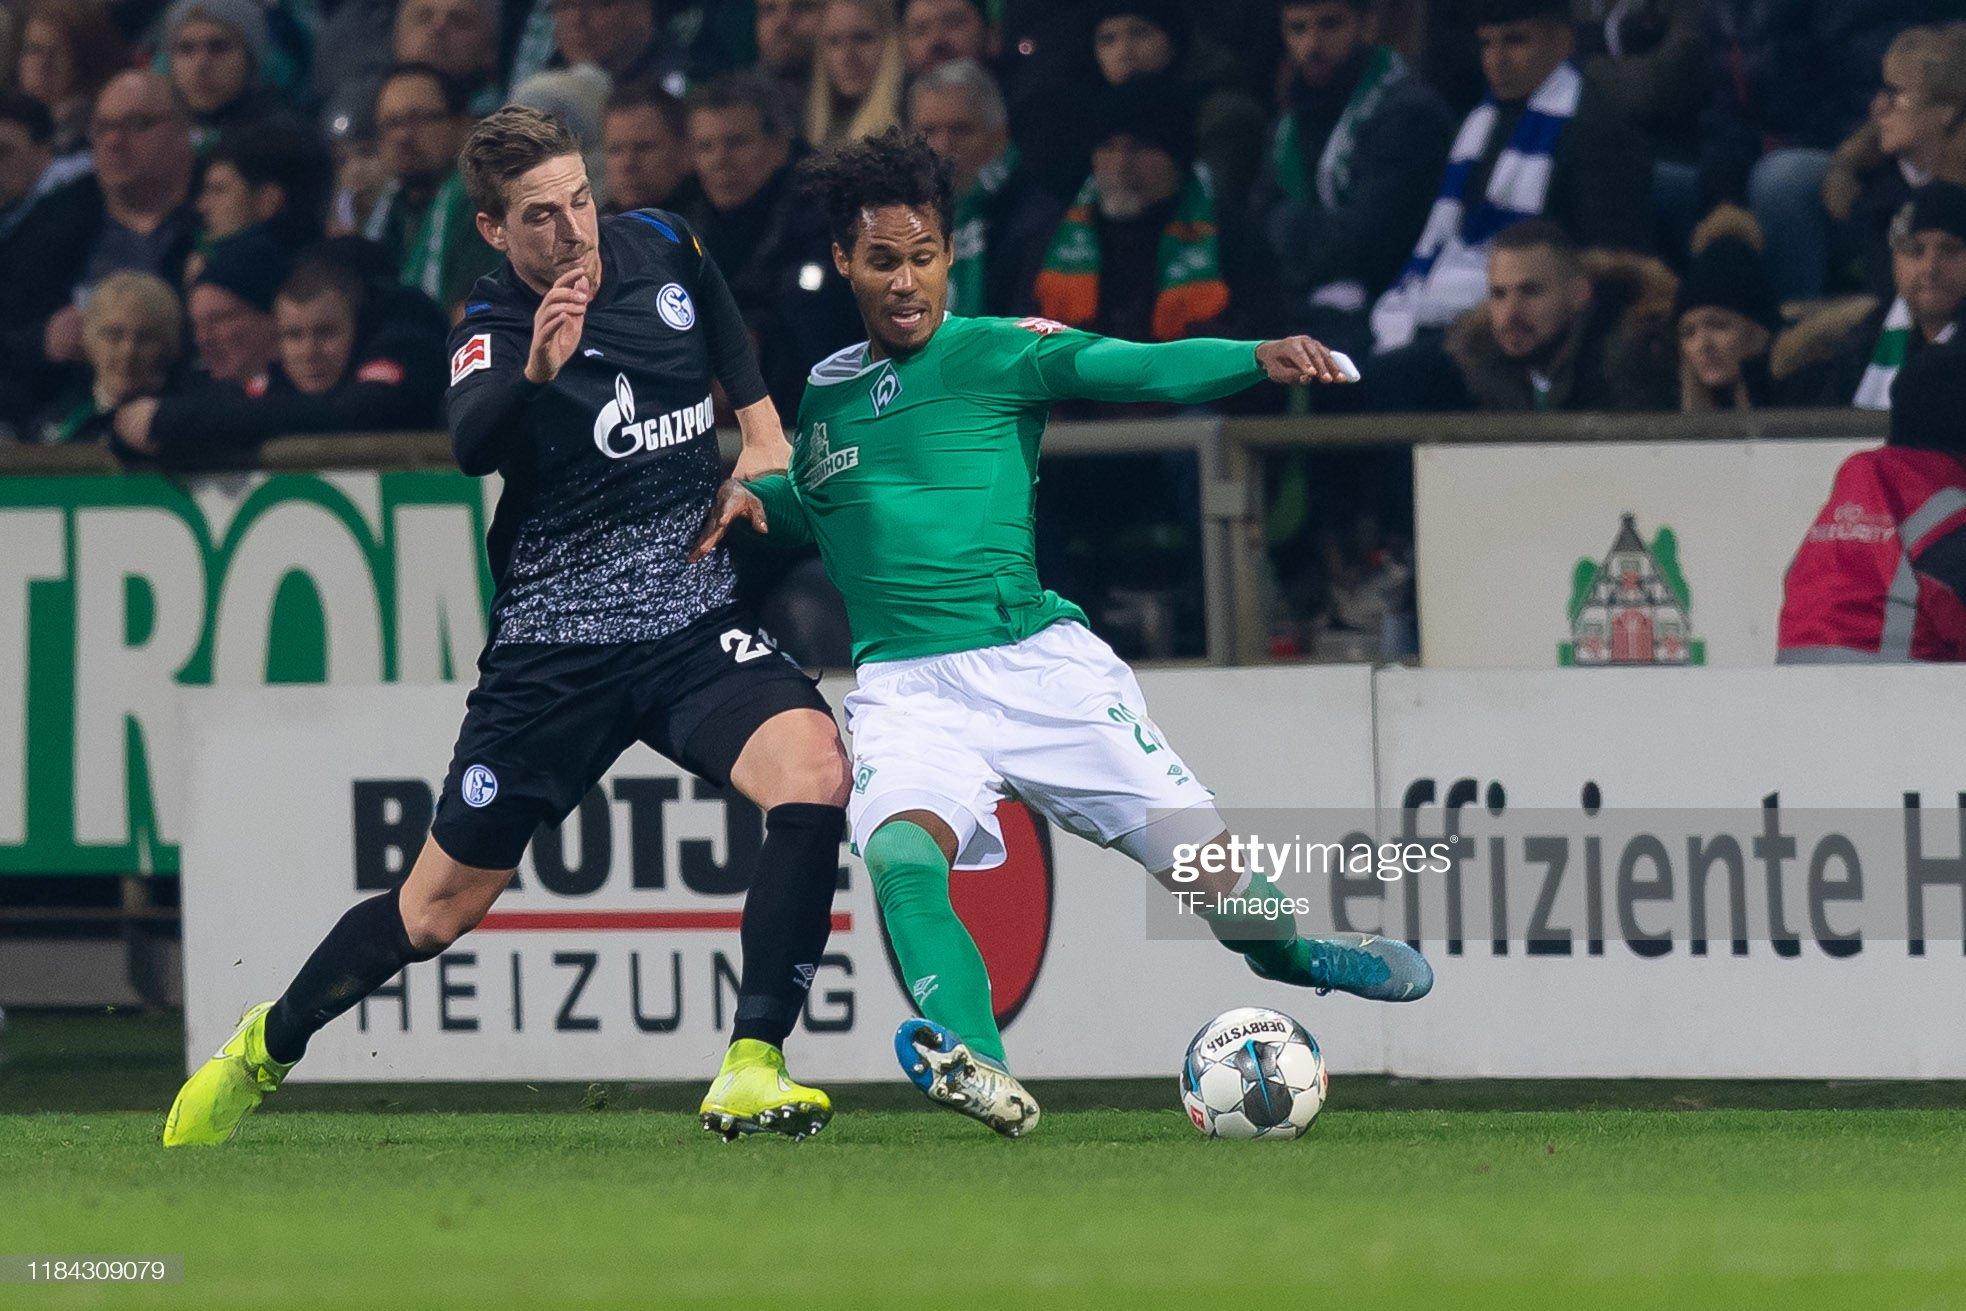 Schalke vs Werder Bremen Preview, prediction and odds